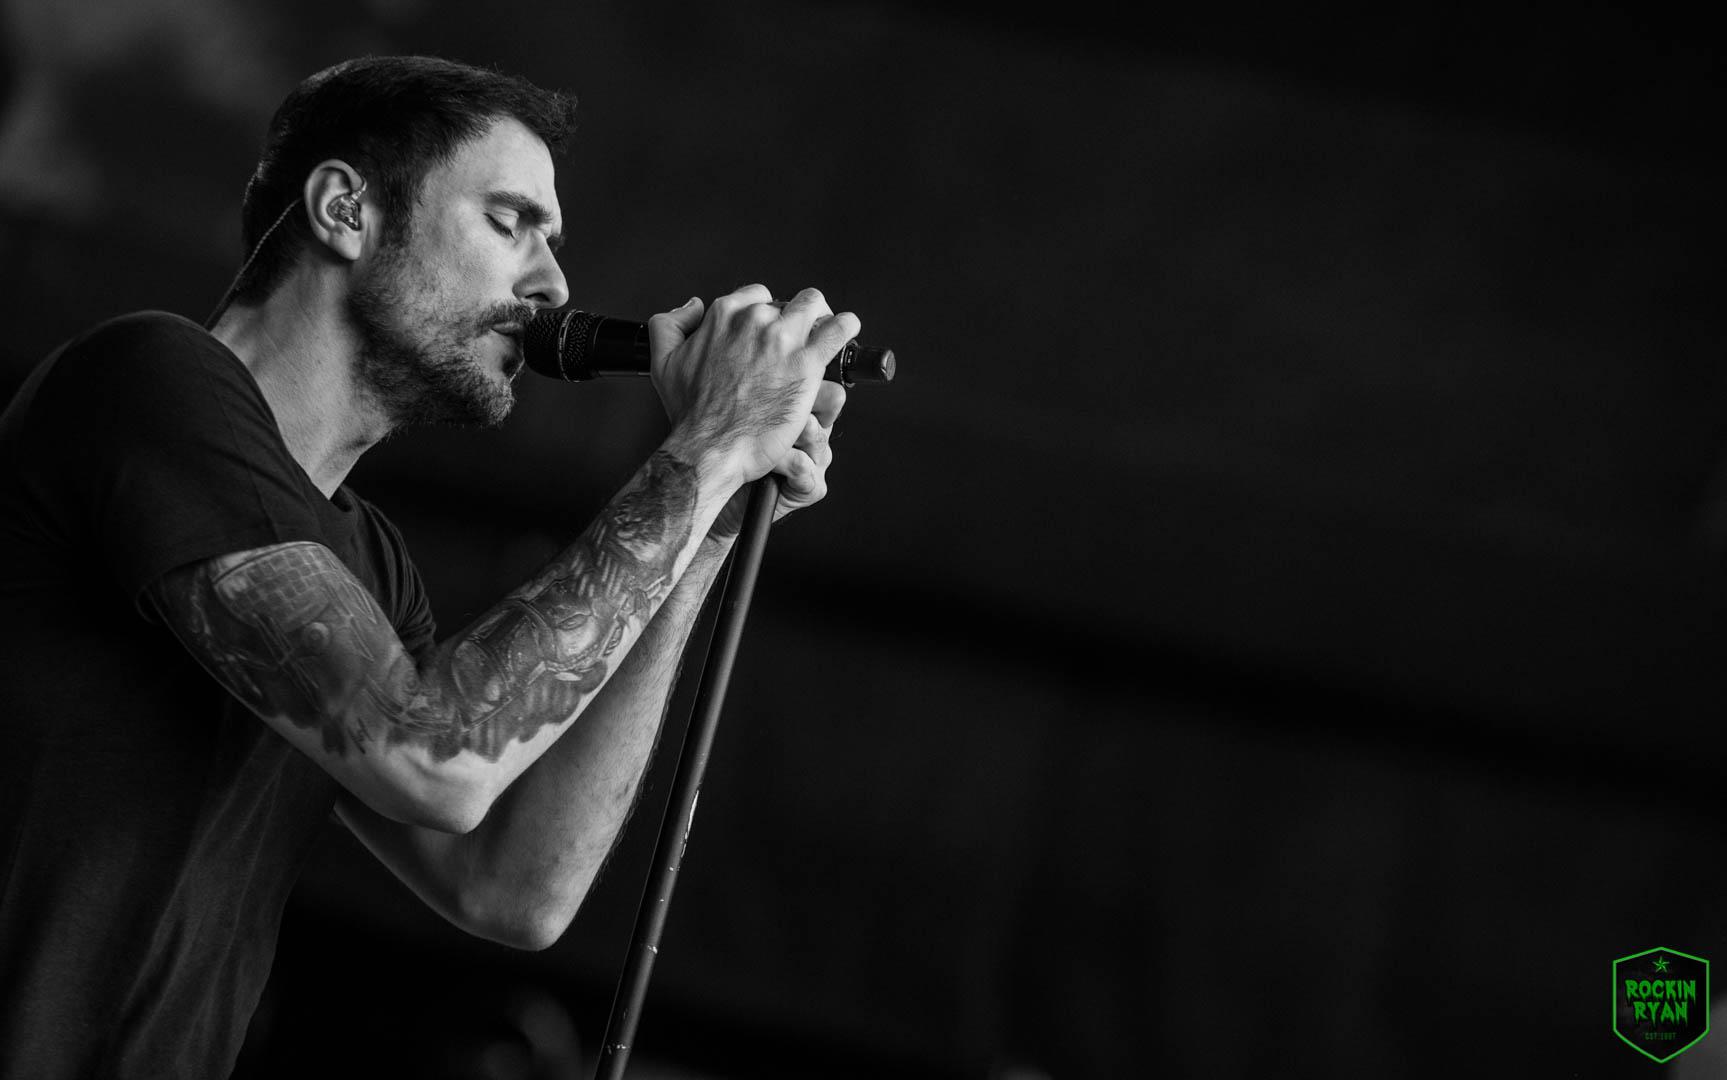 Breaking benjamin tour dates 2019 in Melbourne